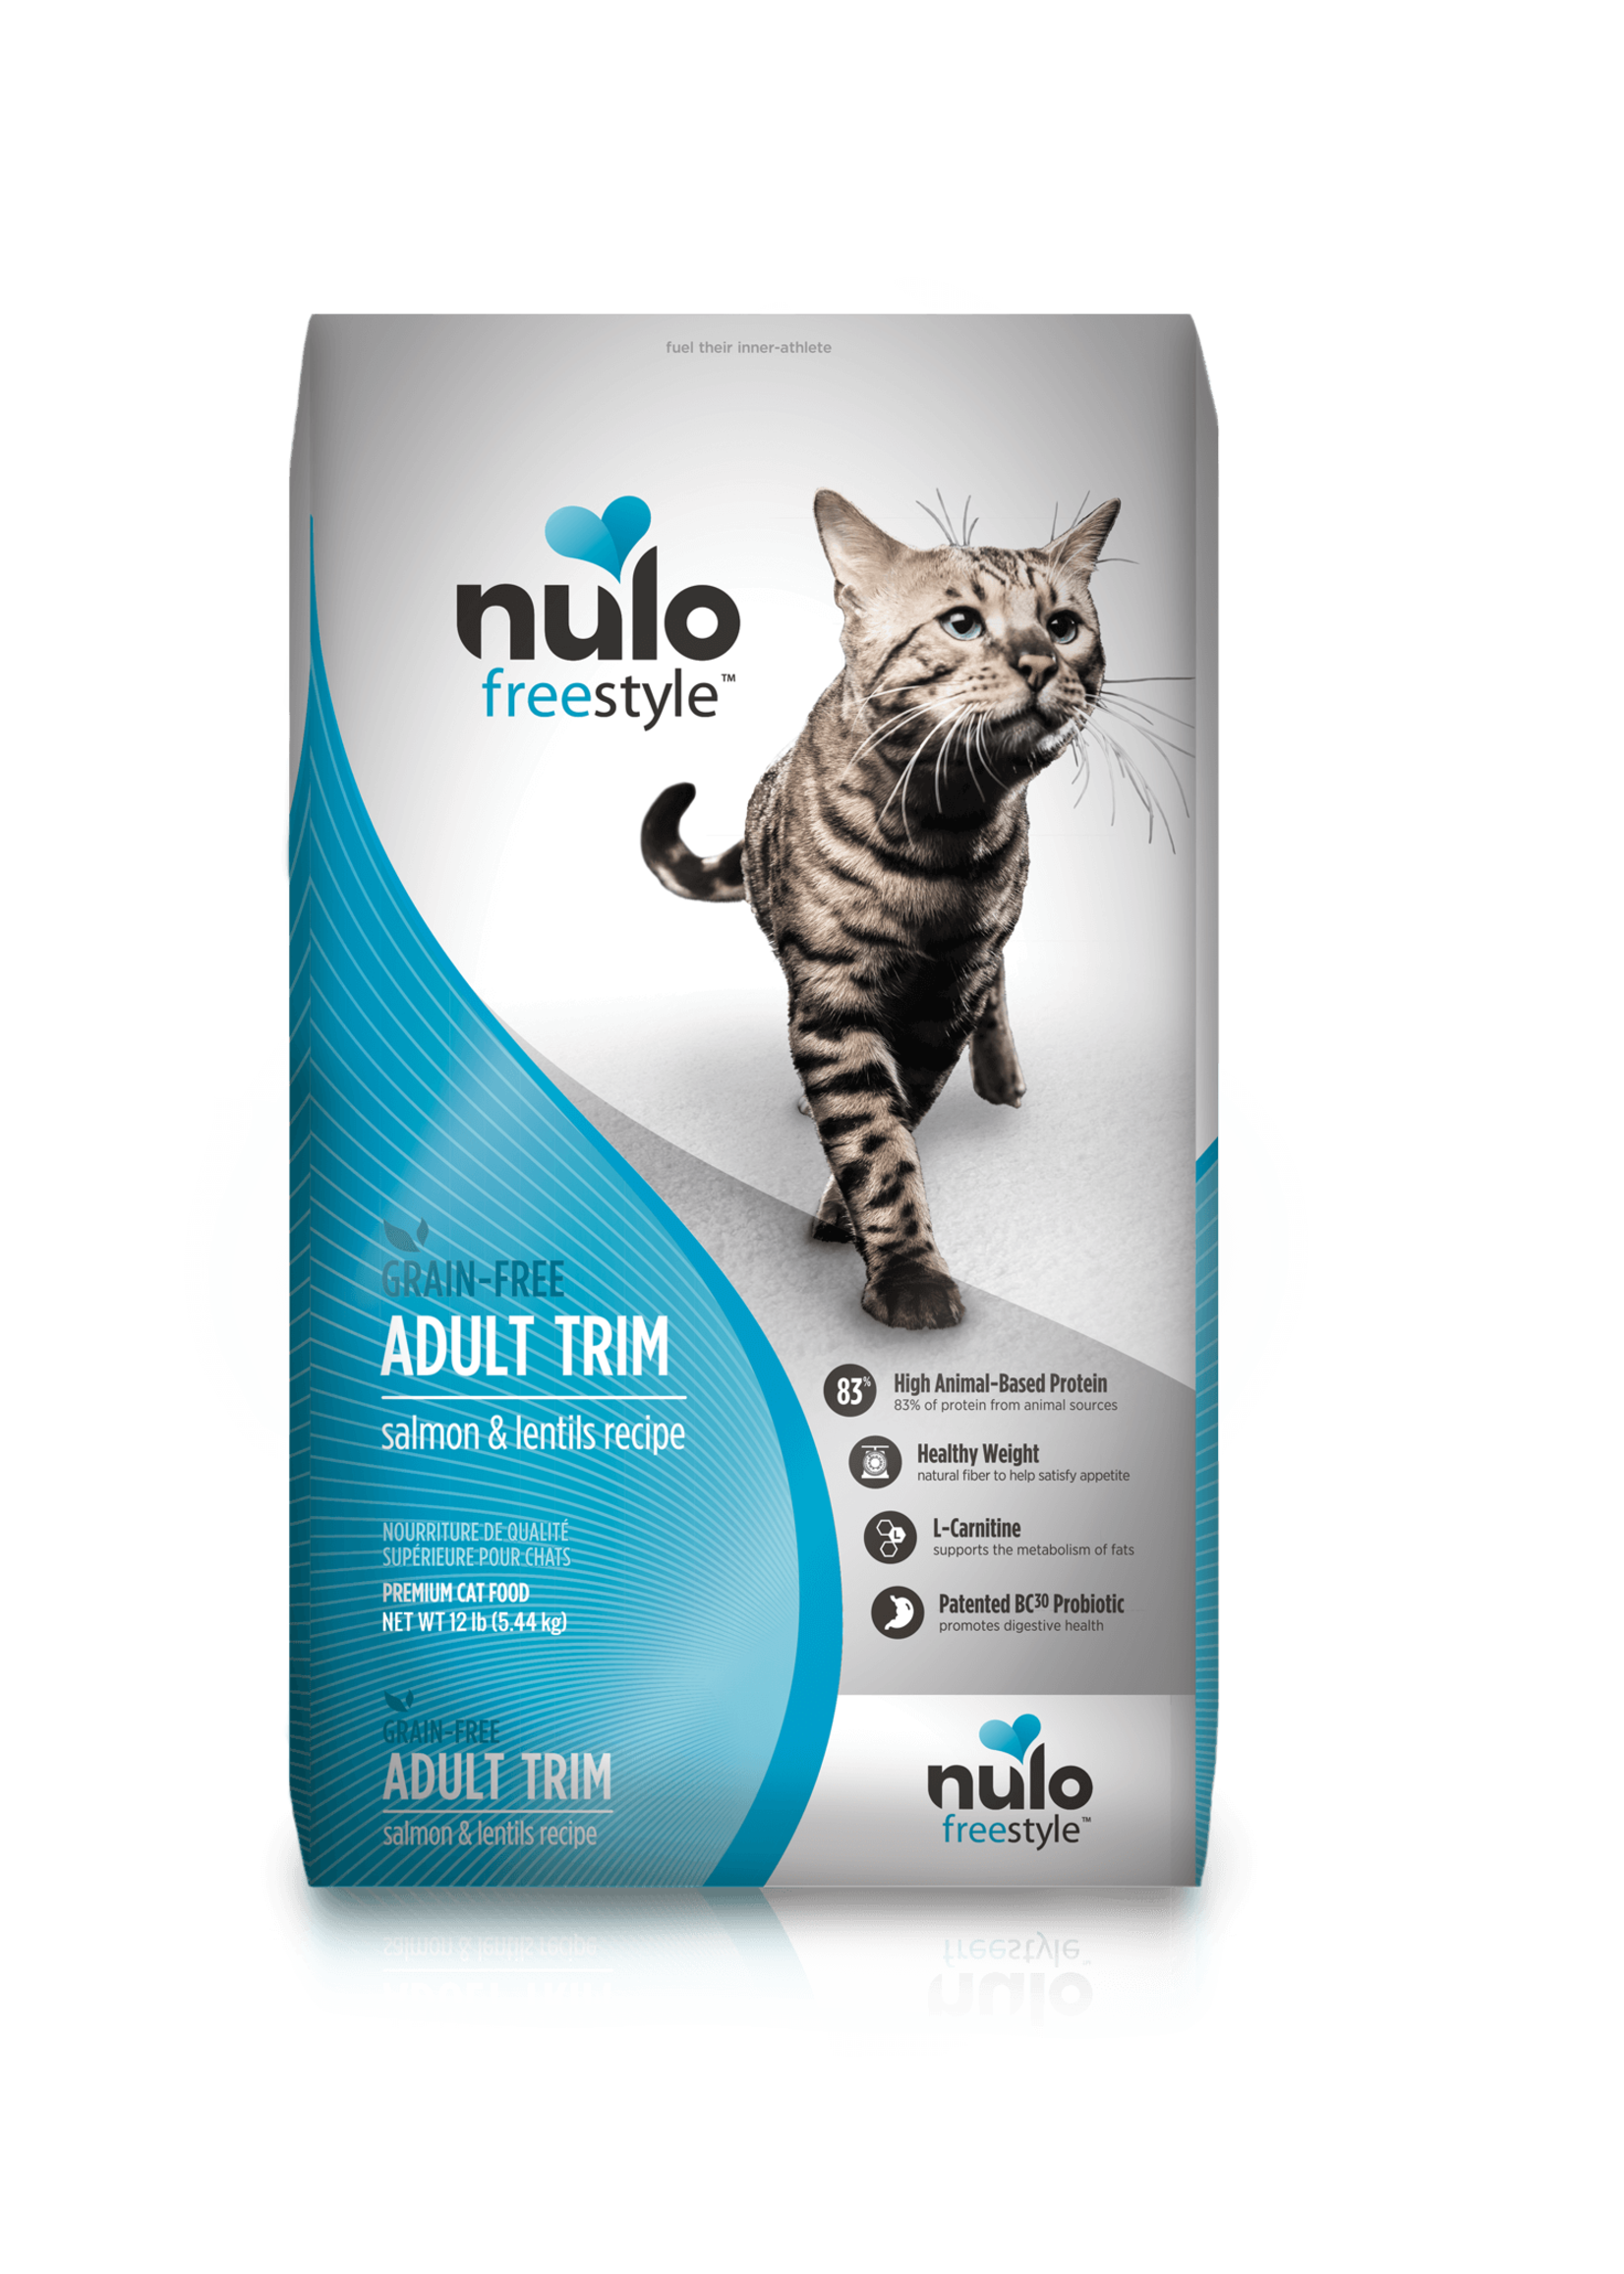 Nulo Nulo FreeStyle Adult Trim Cat Food